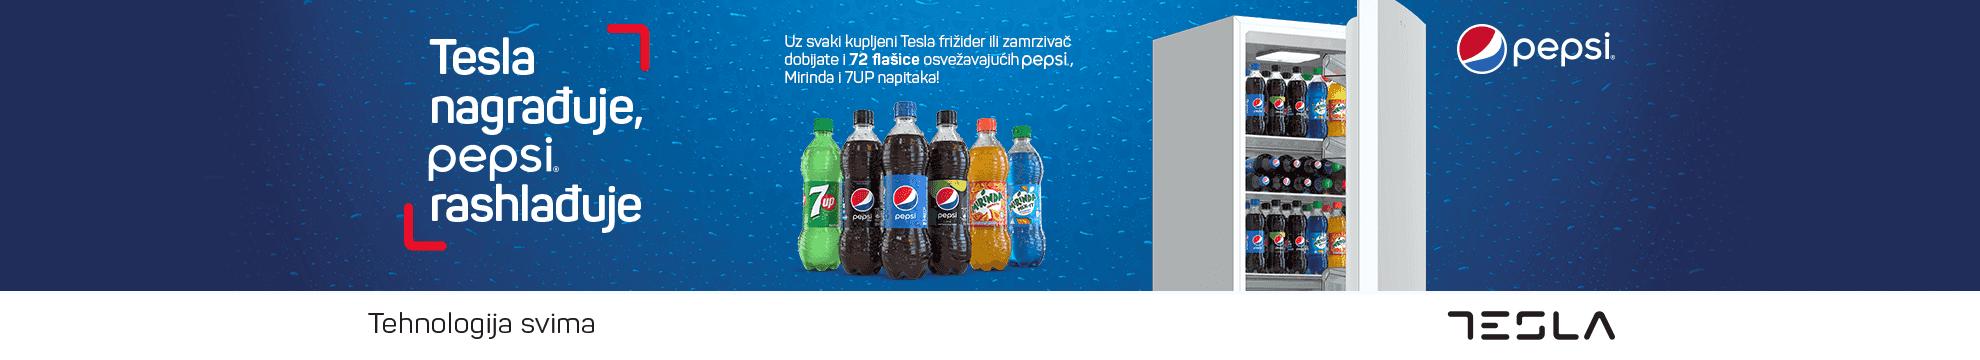 tesla poklanja Pepsi